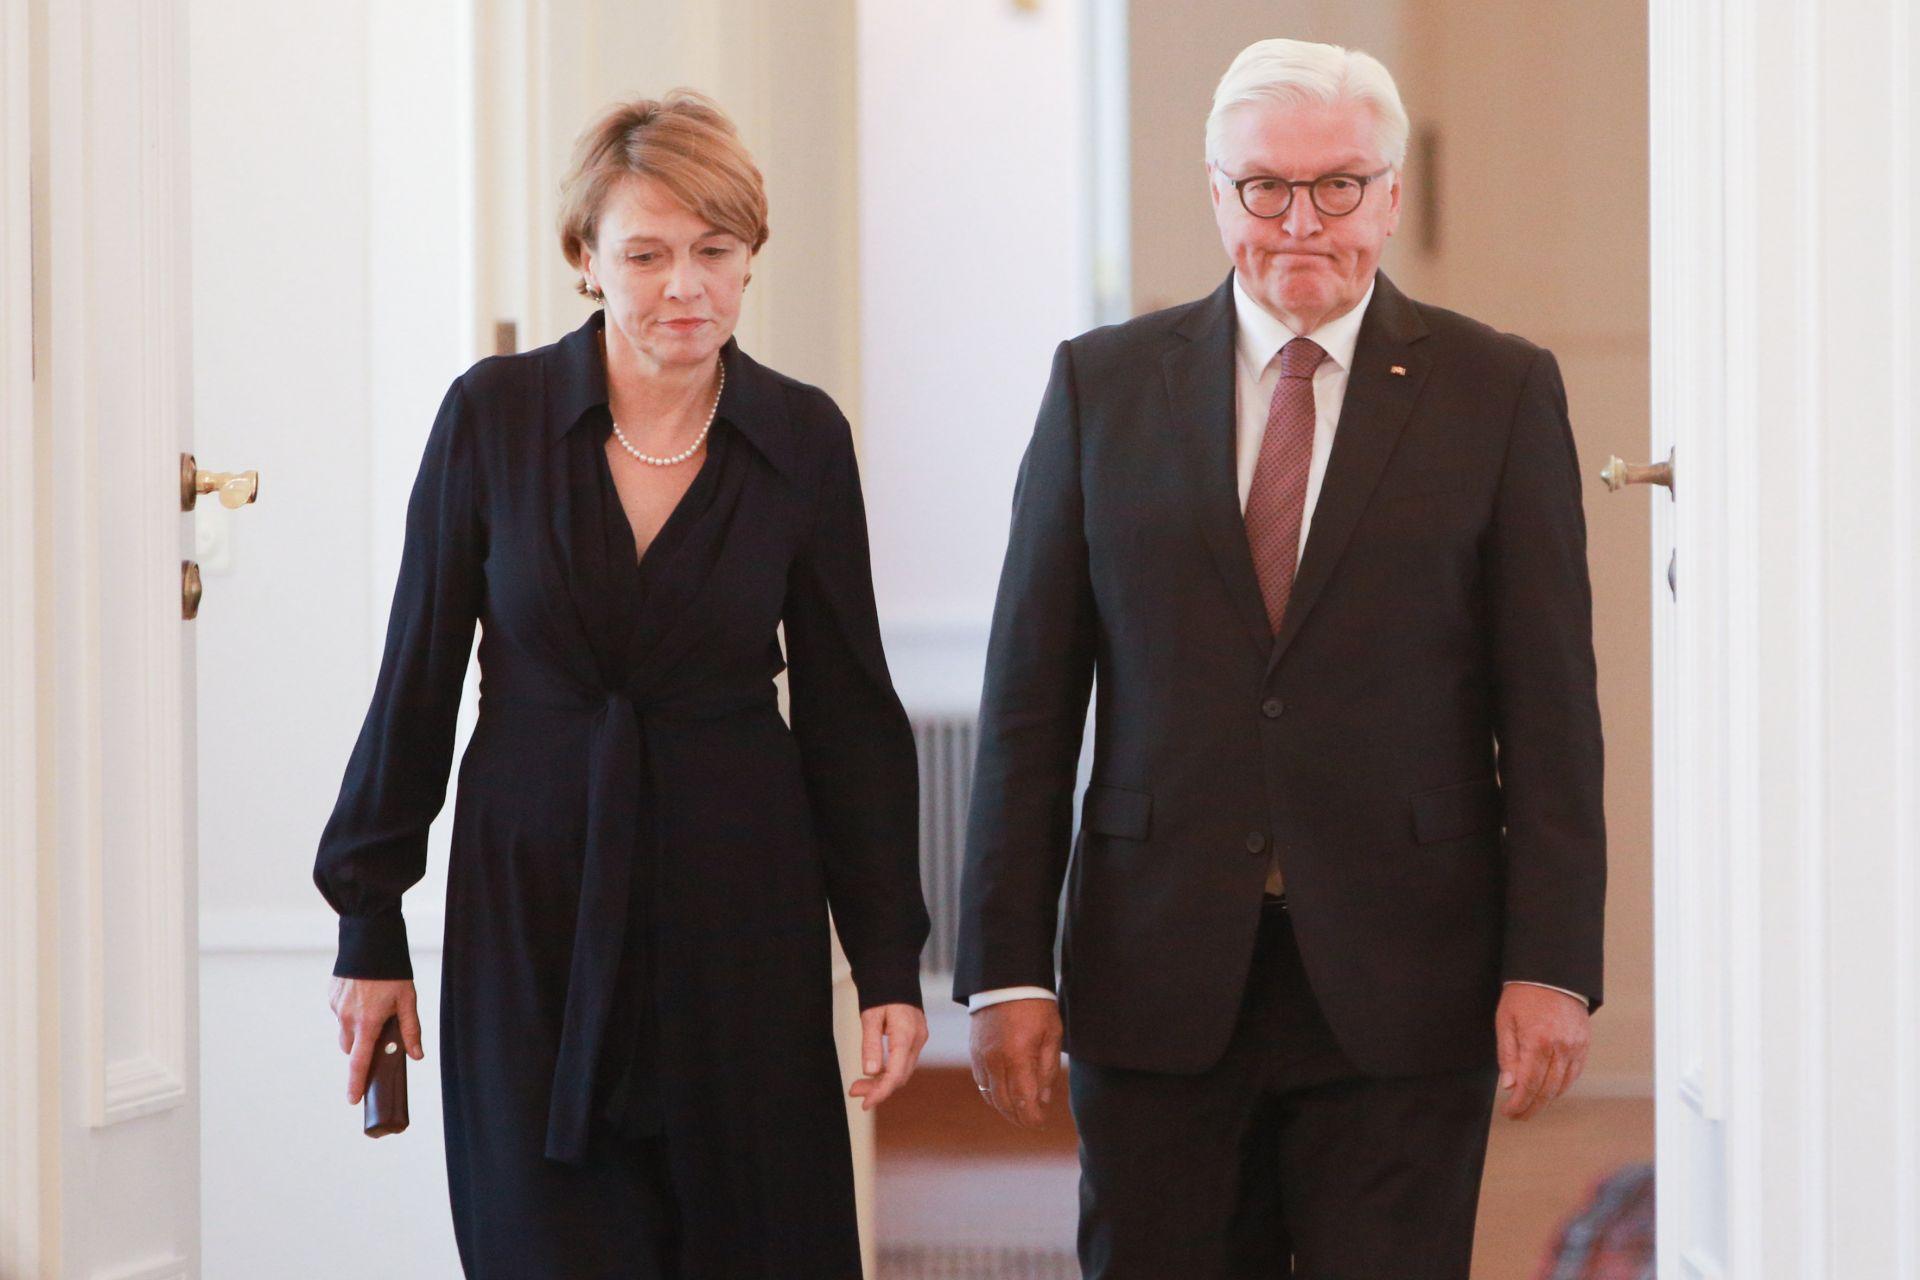 Германският президент Франк-Валтер Щайнмайер и жена му Елке Бюденбендер